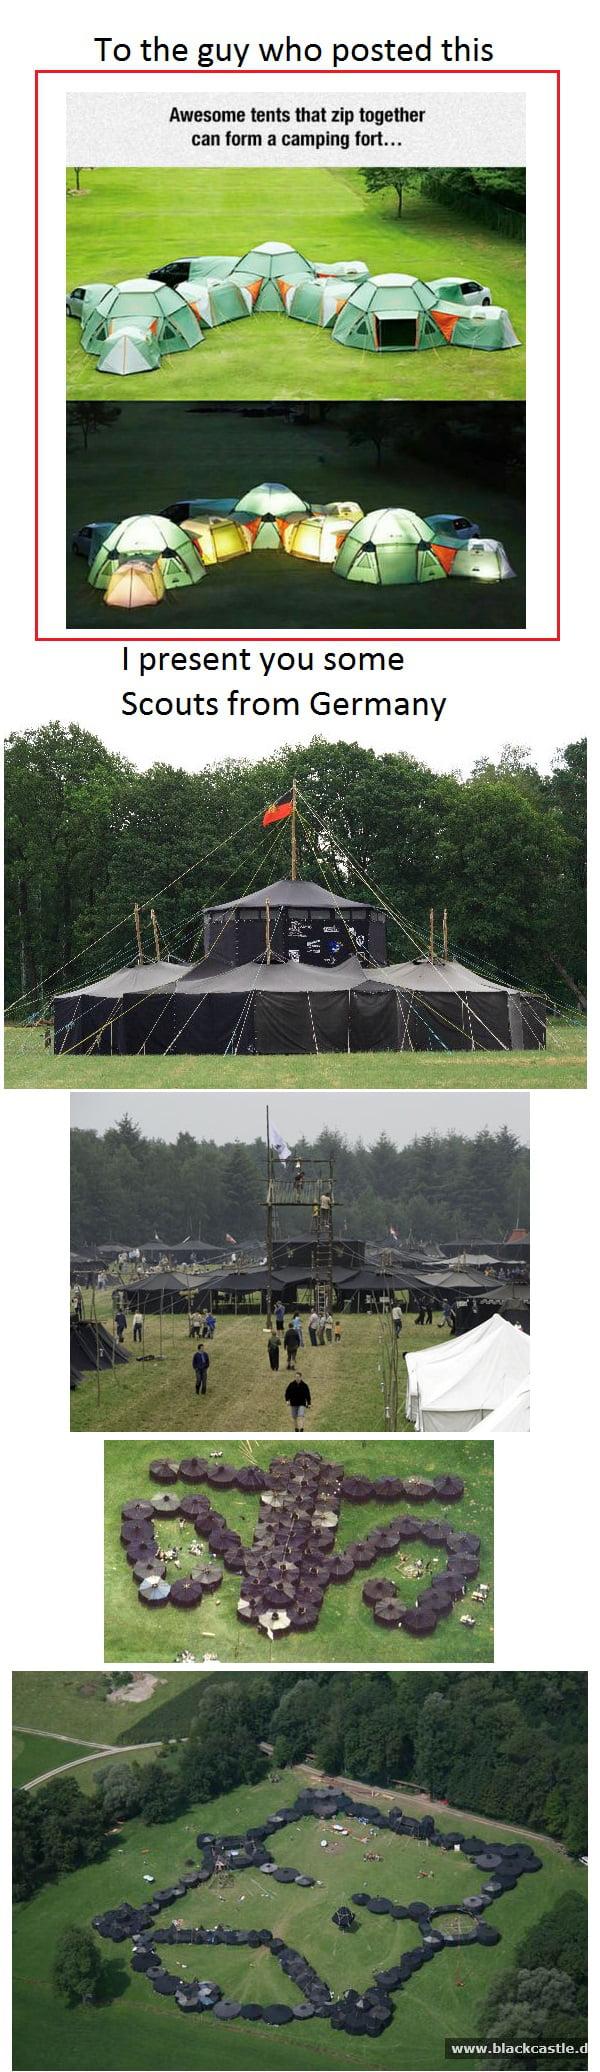 Tent citys already exist